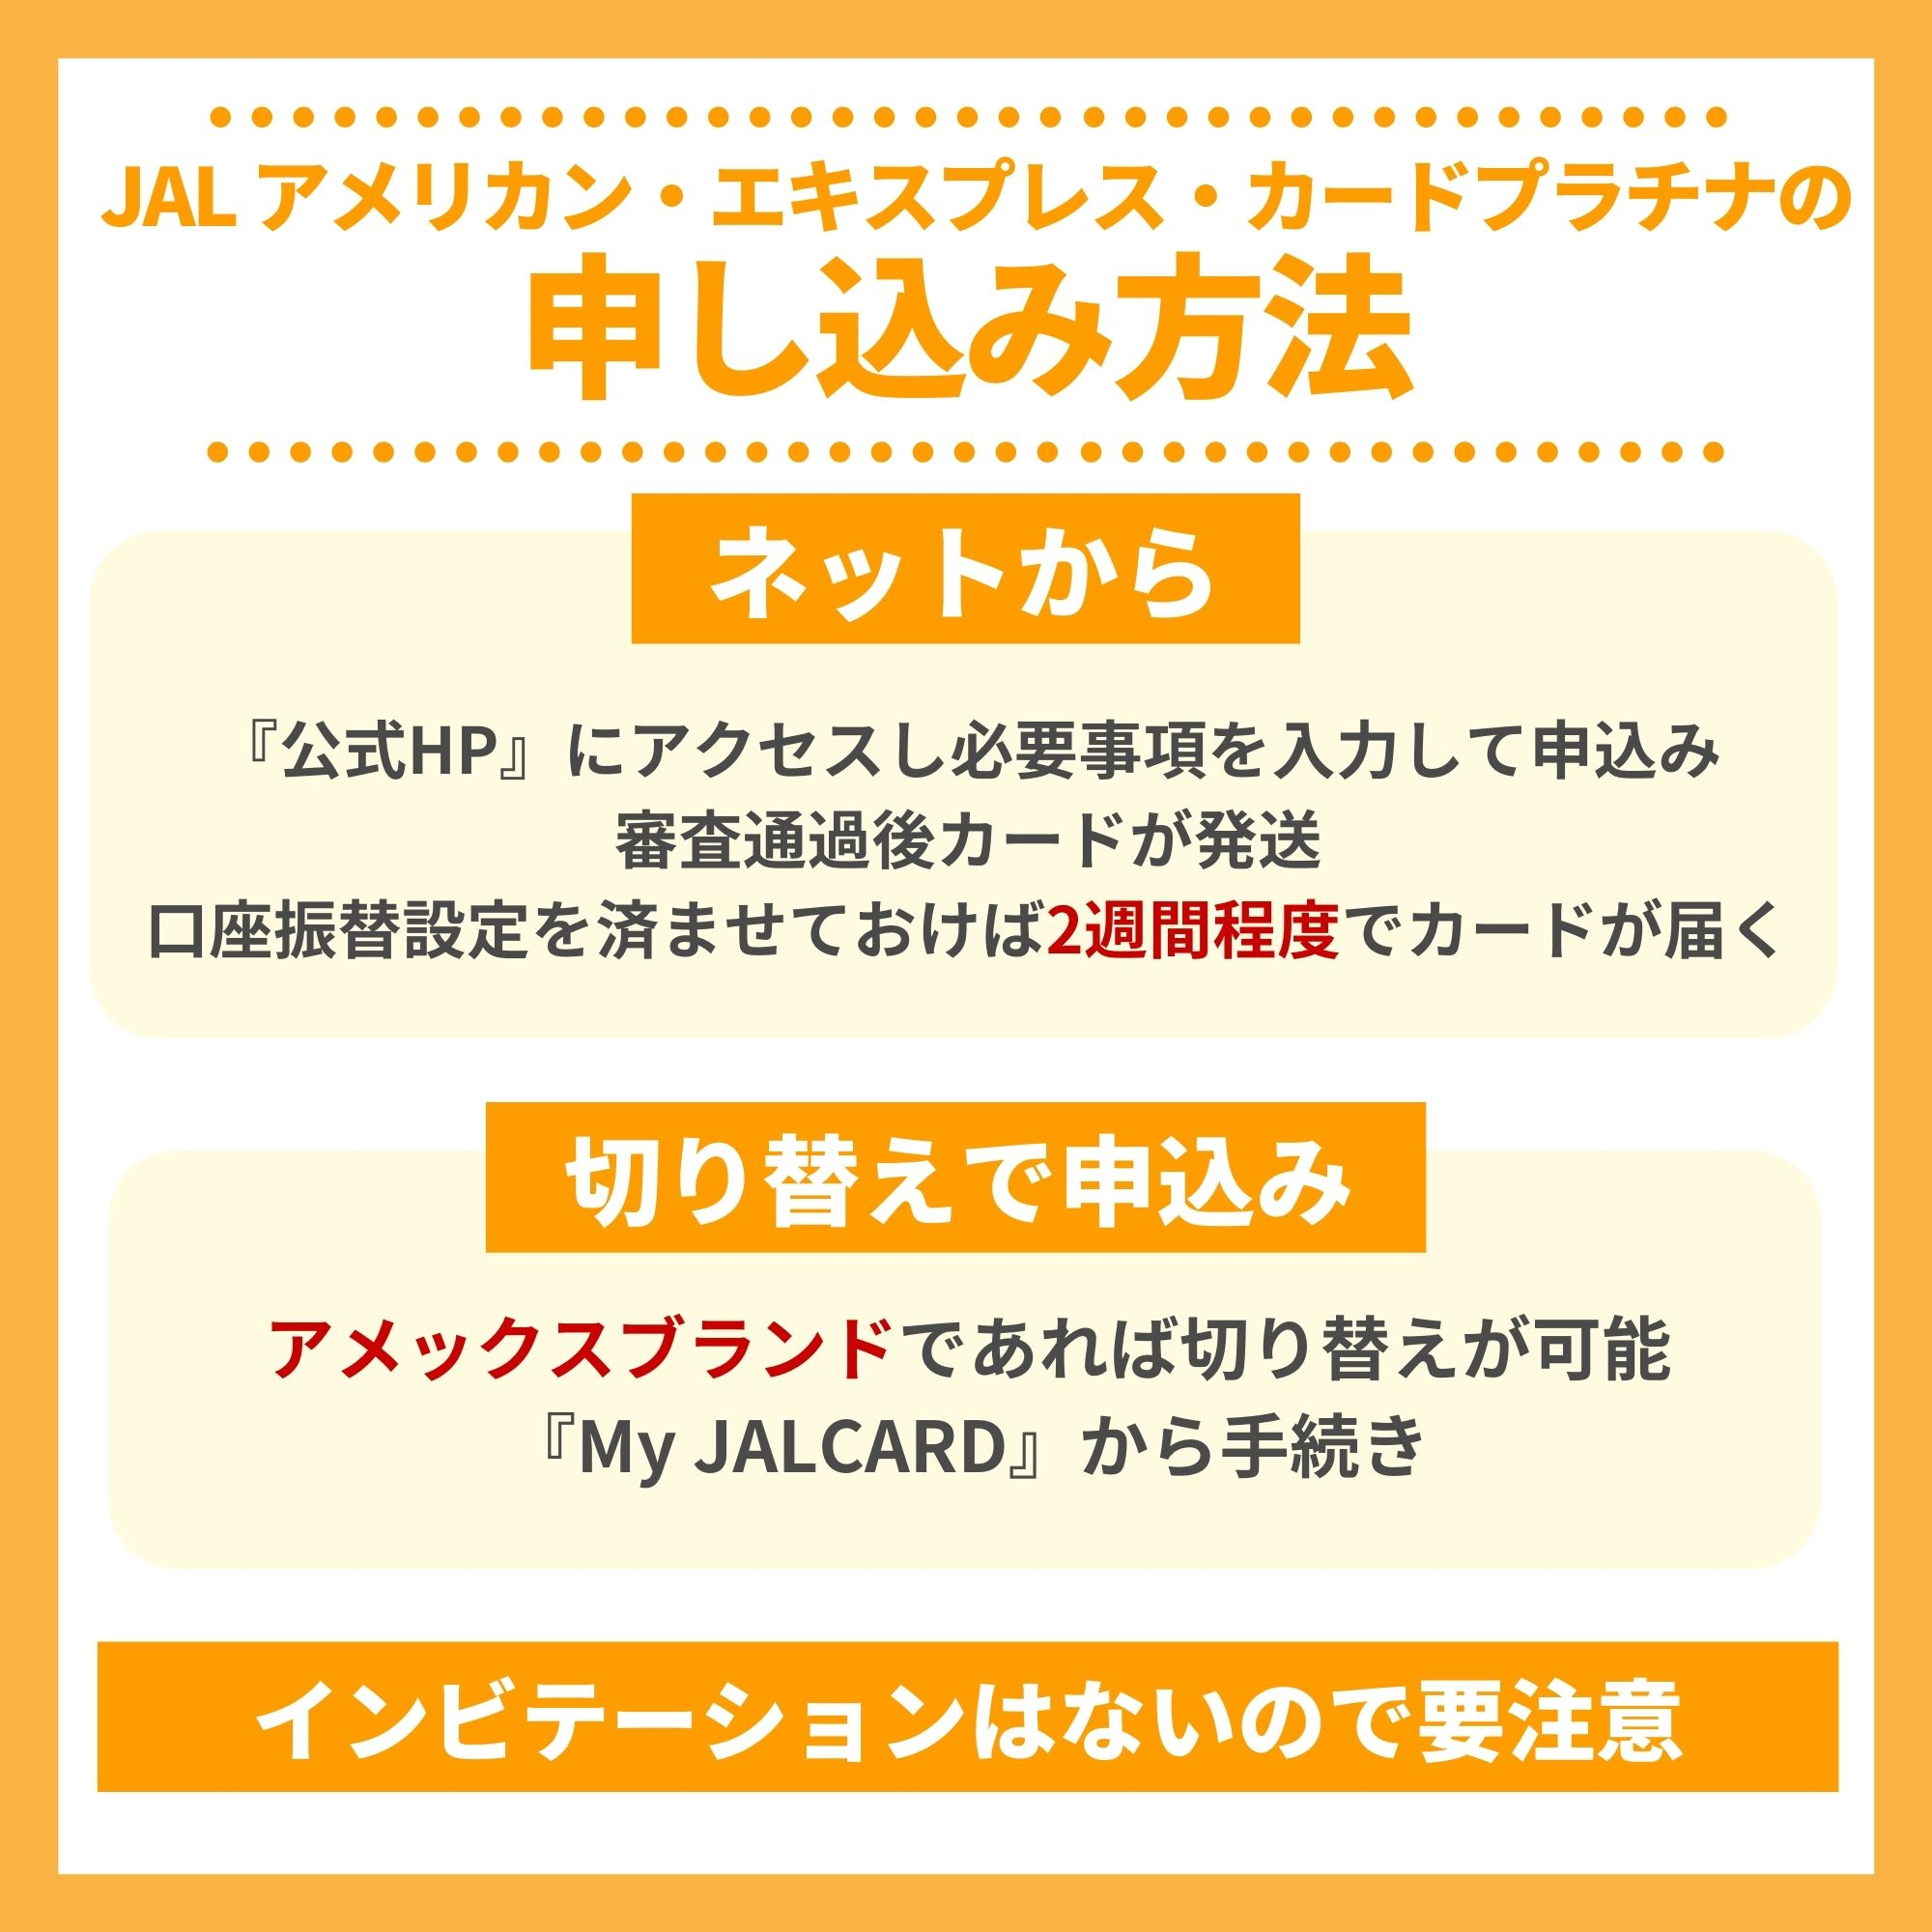 JAL アメリカン・エキスプレス・カードプラチナの申込み・入手方法